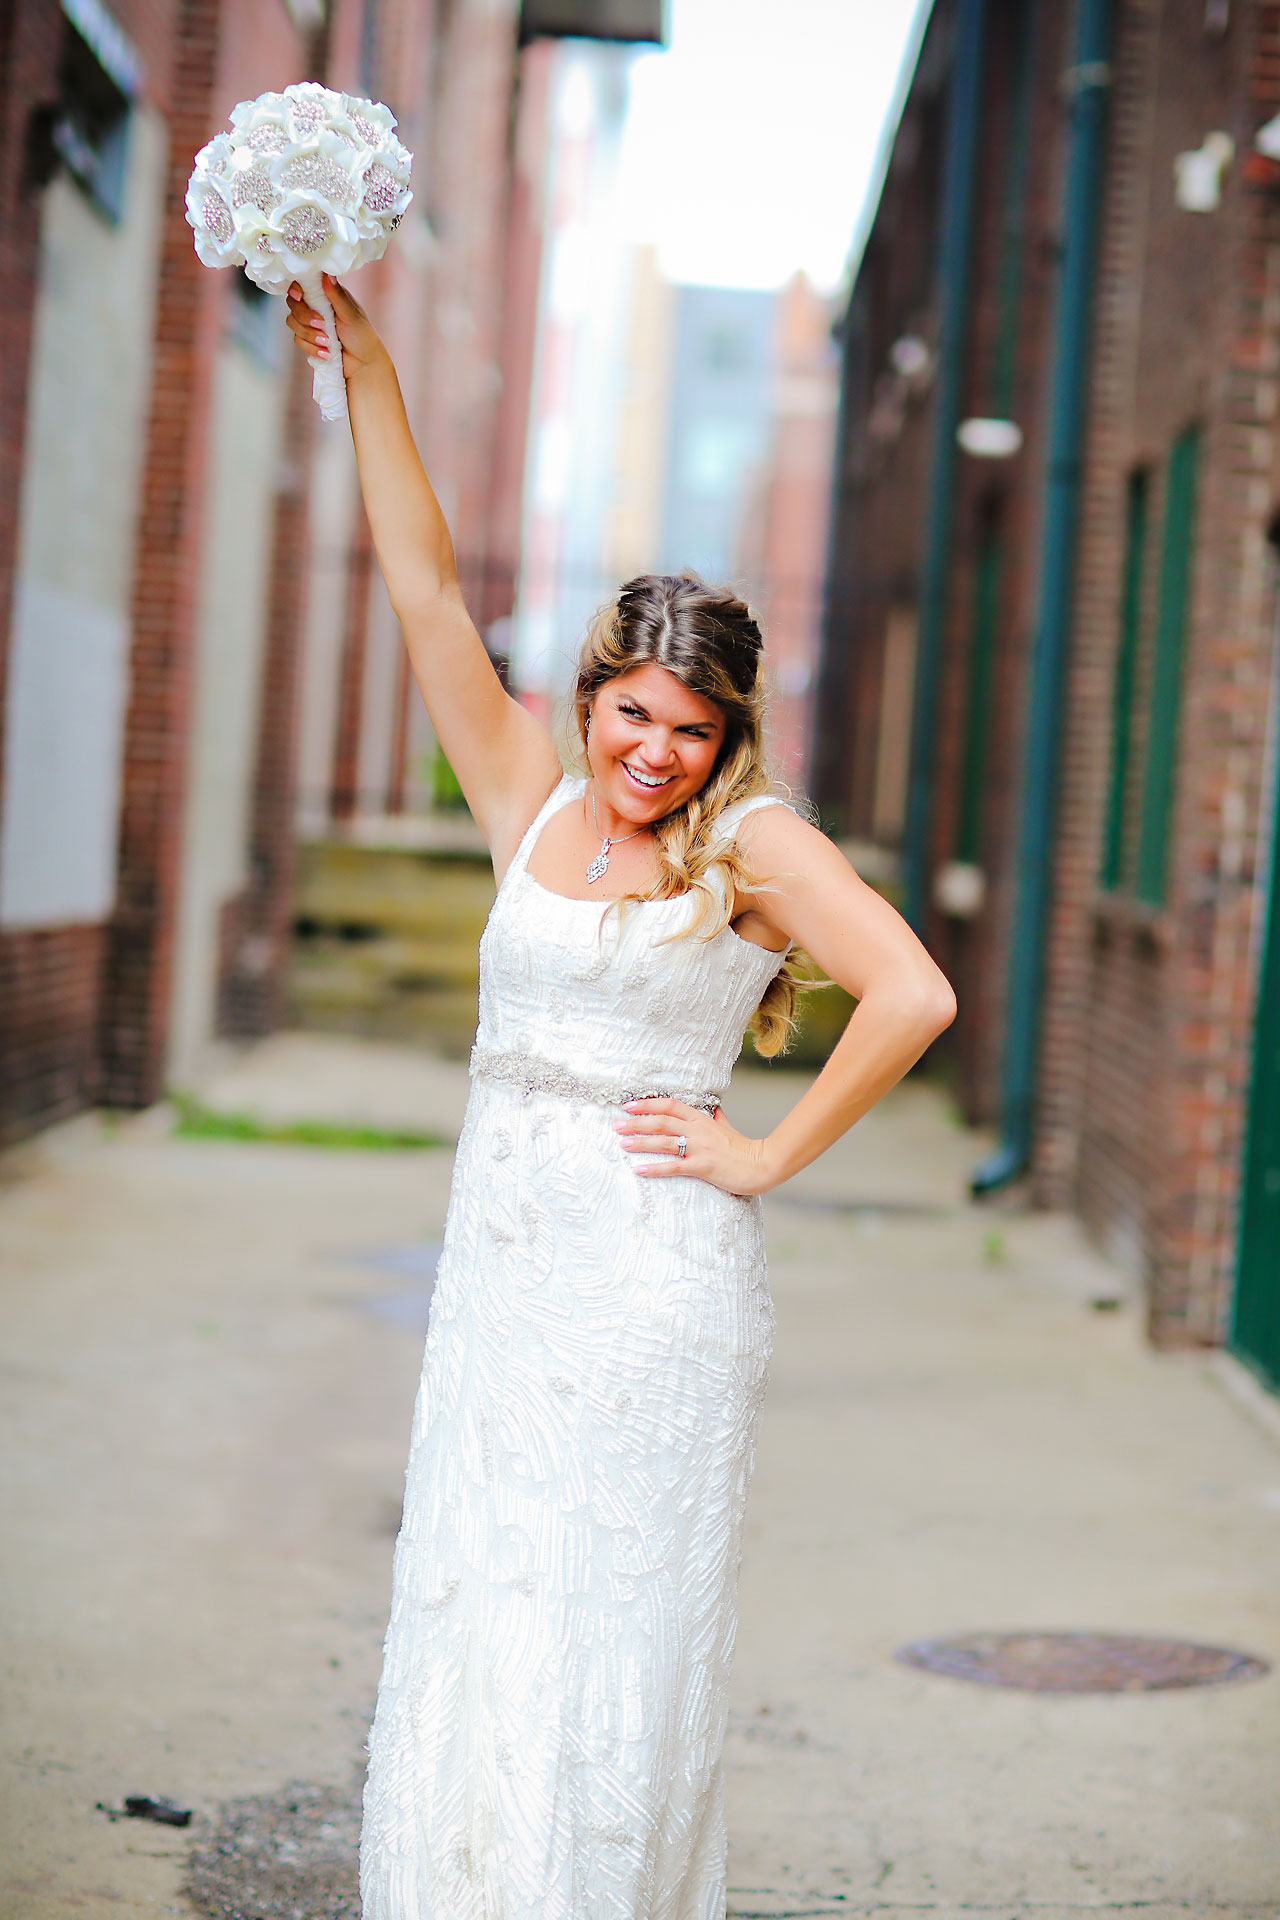 Amy Nick Canal 337 Wedding 115